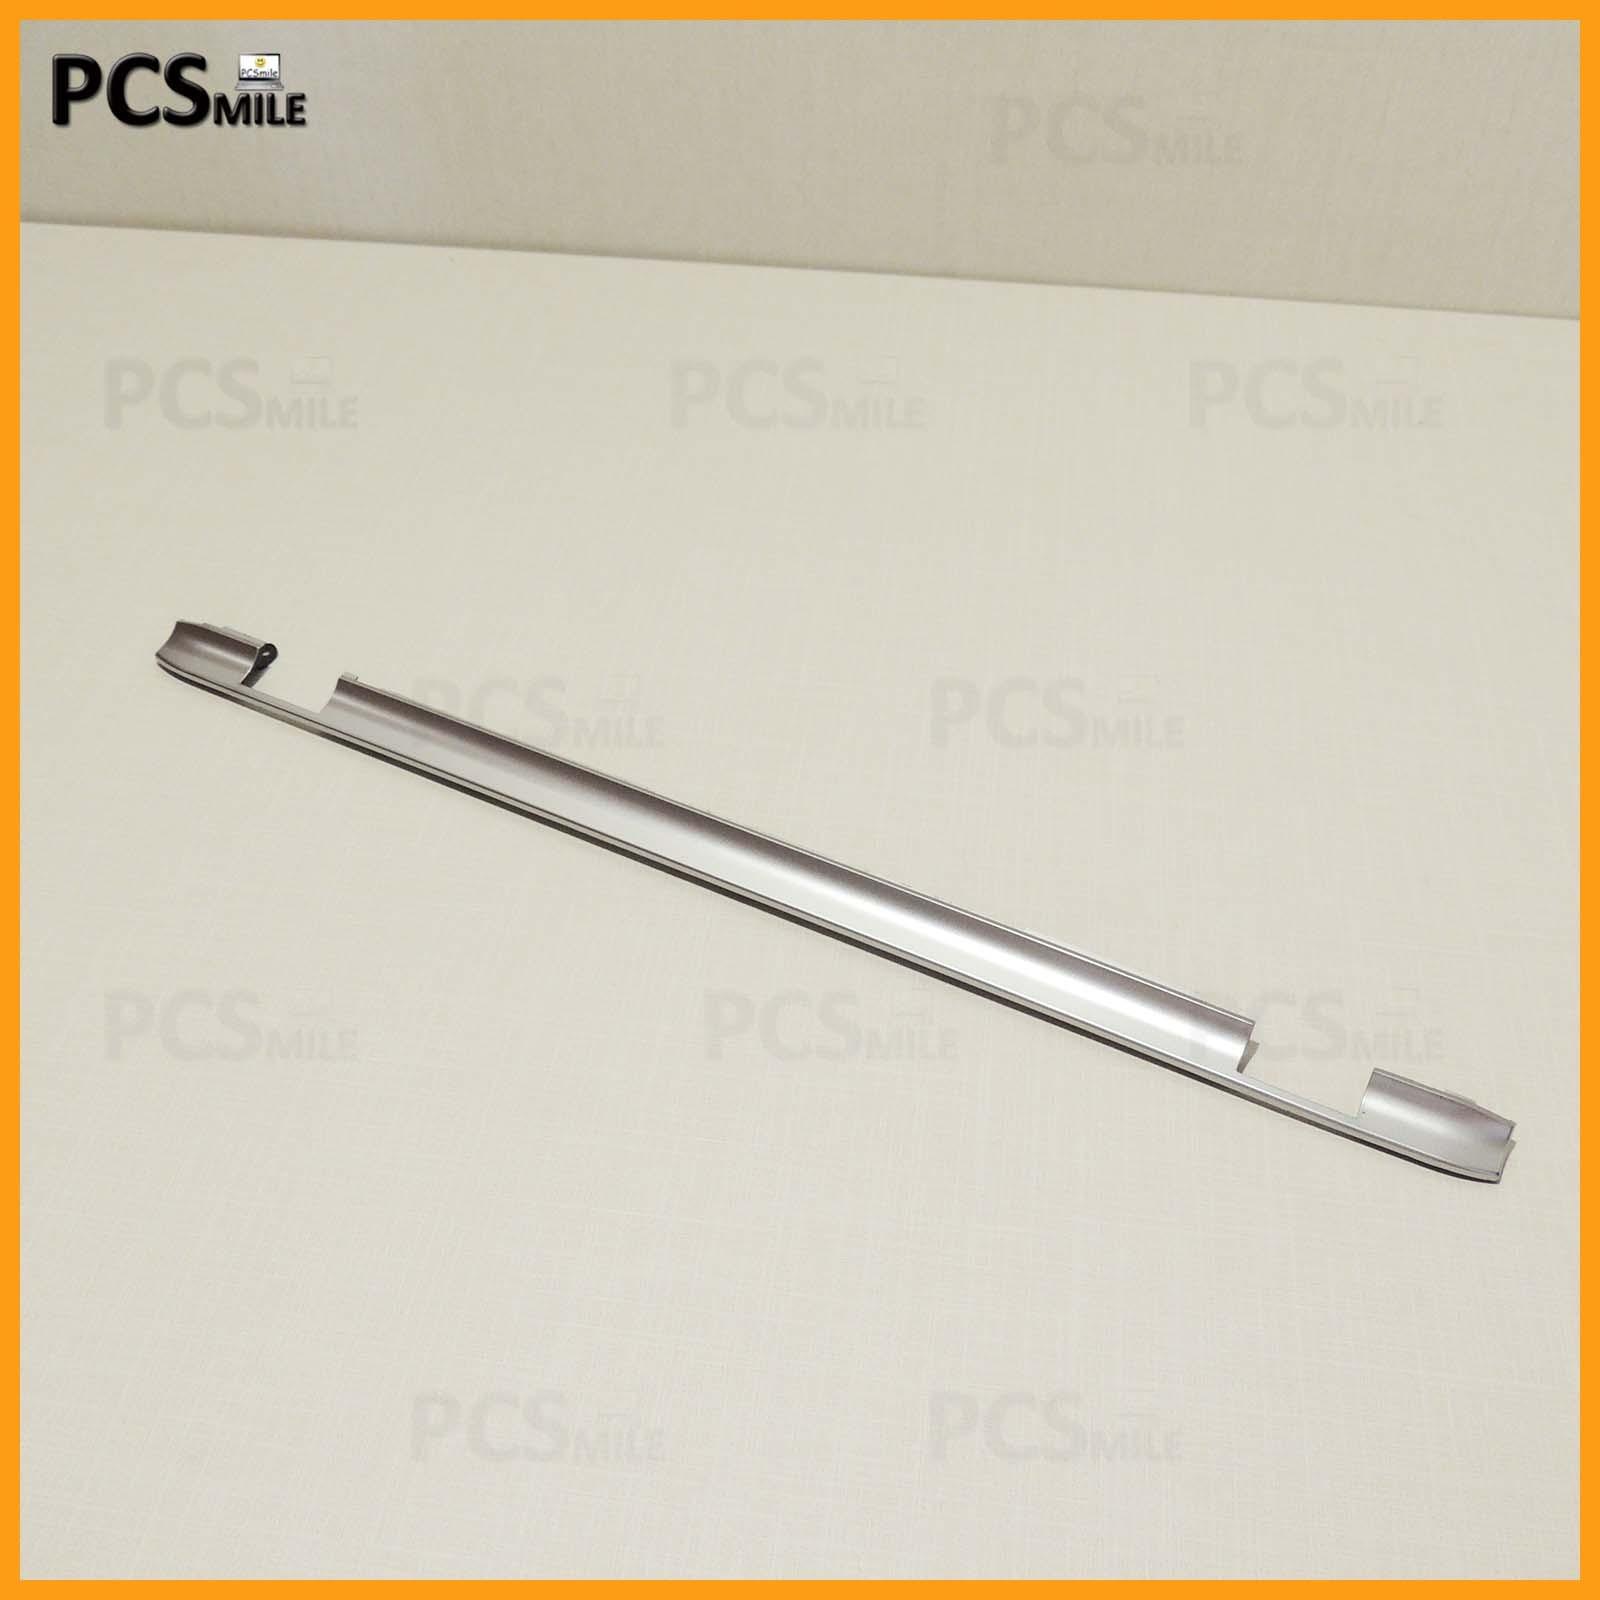 Scocca HP PAVILION DV6700 DV6728EL scocca cerniere cover zye rev:3a ebat8005018